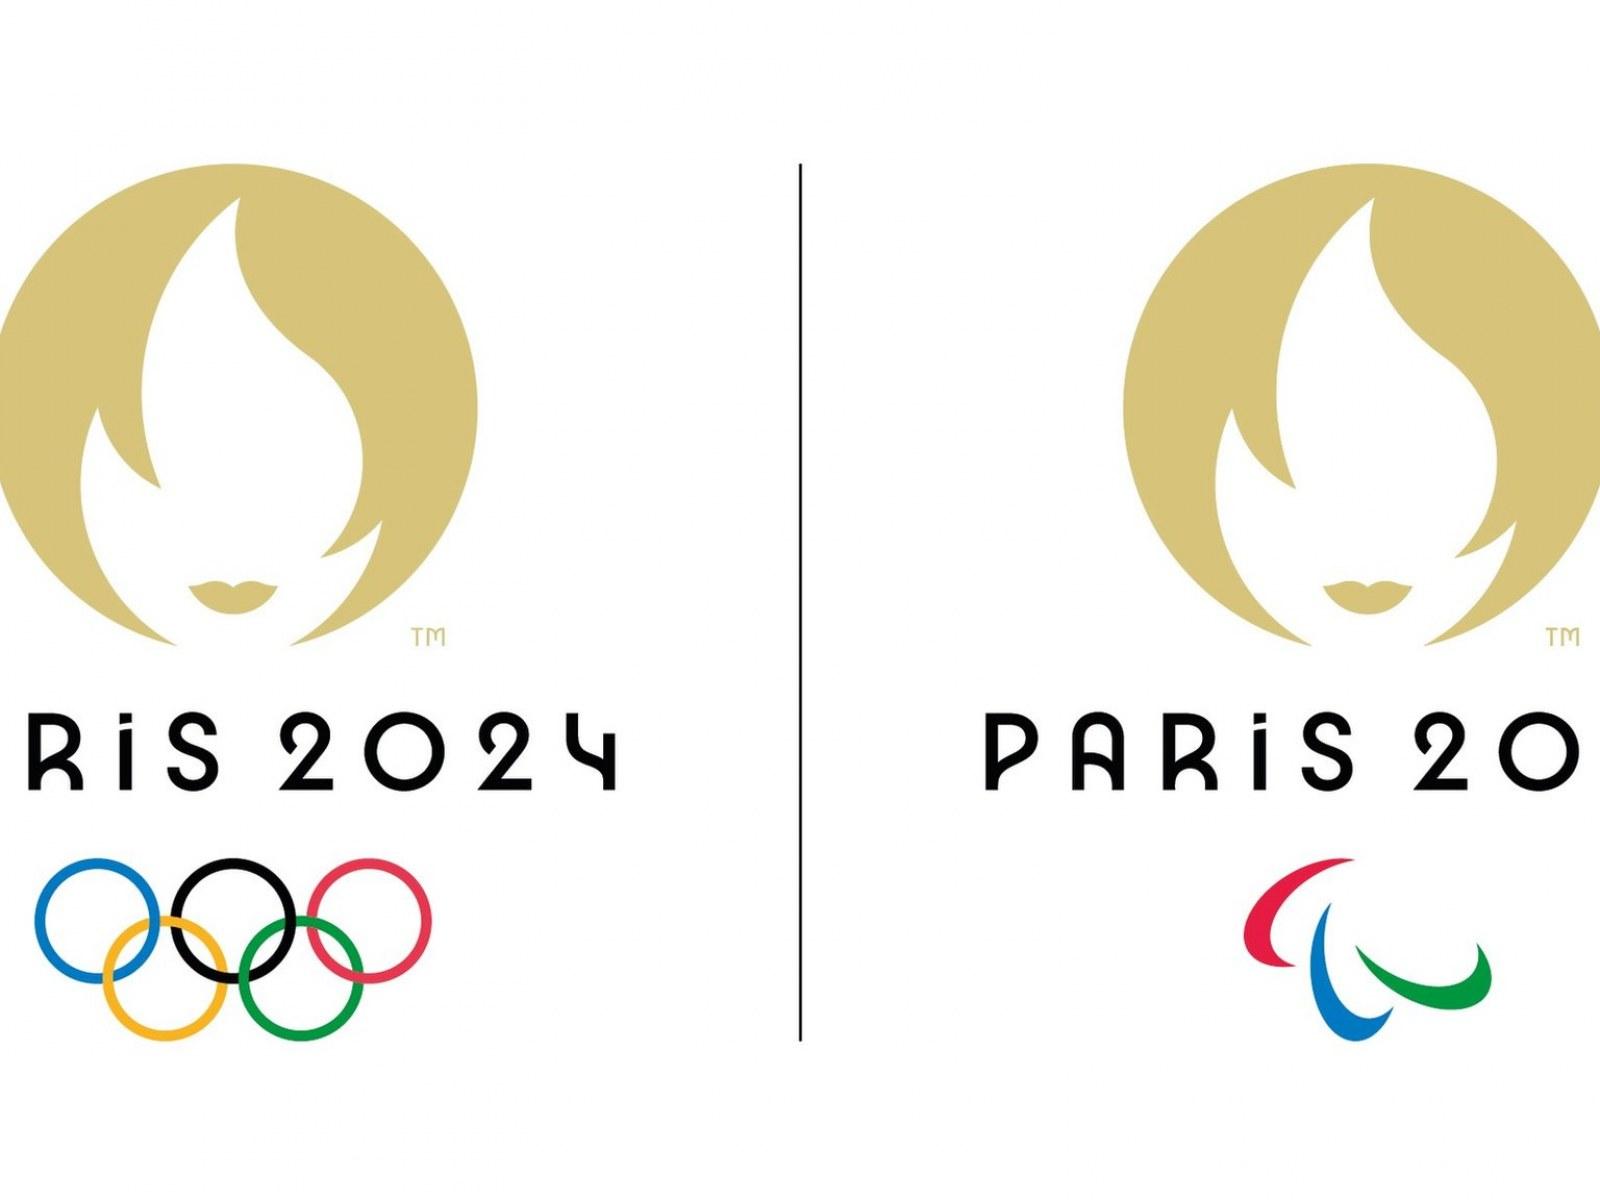 Paris 20 Olympics Logo Mocked for Resembling Dating App